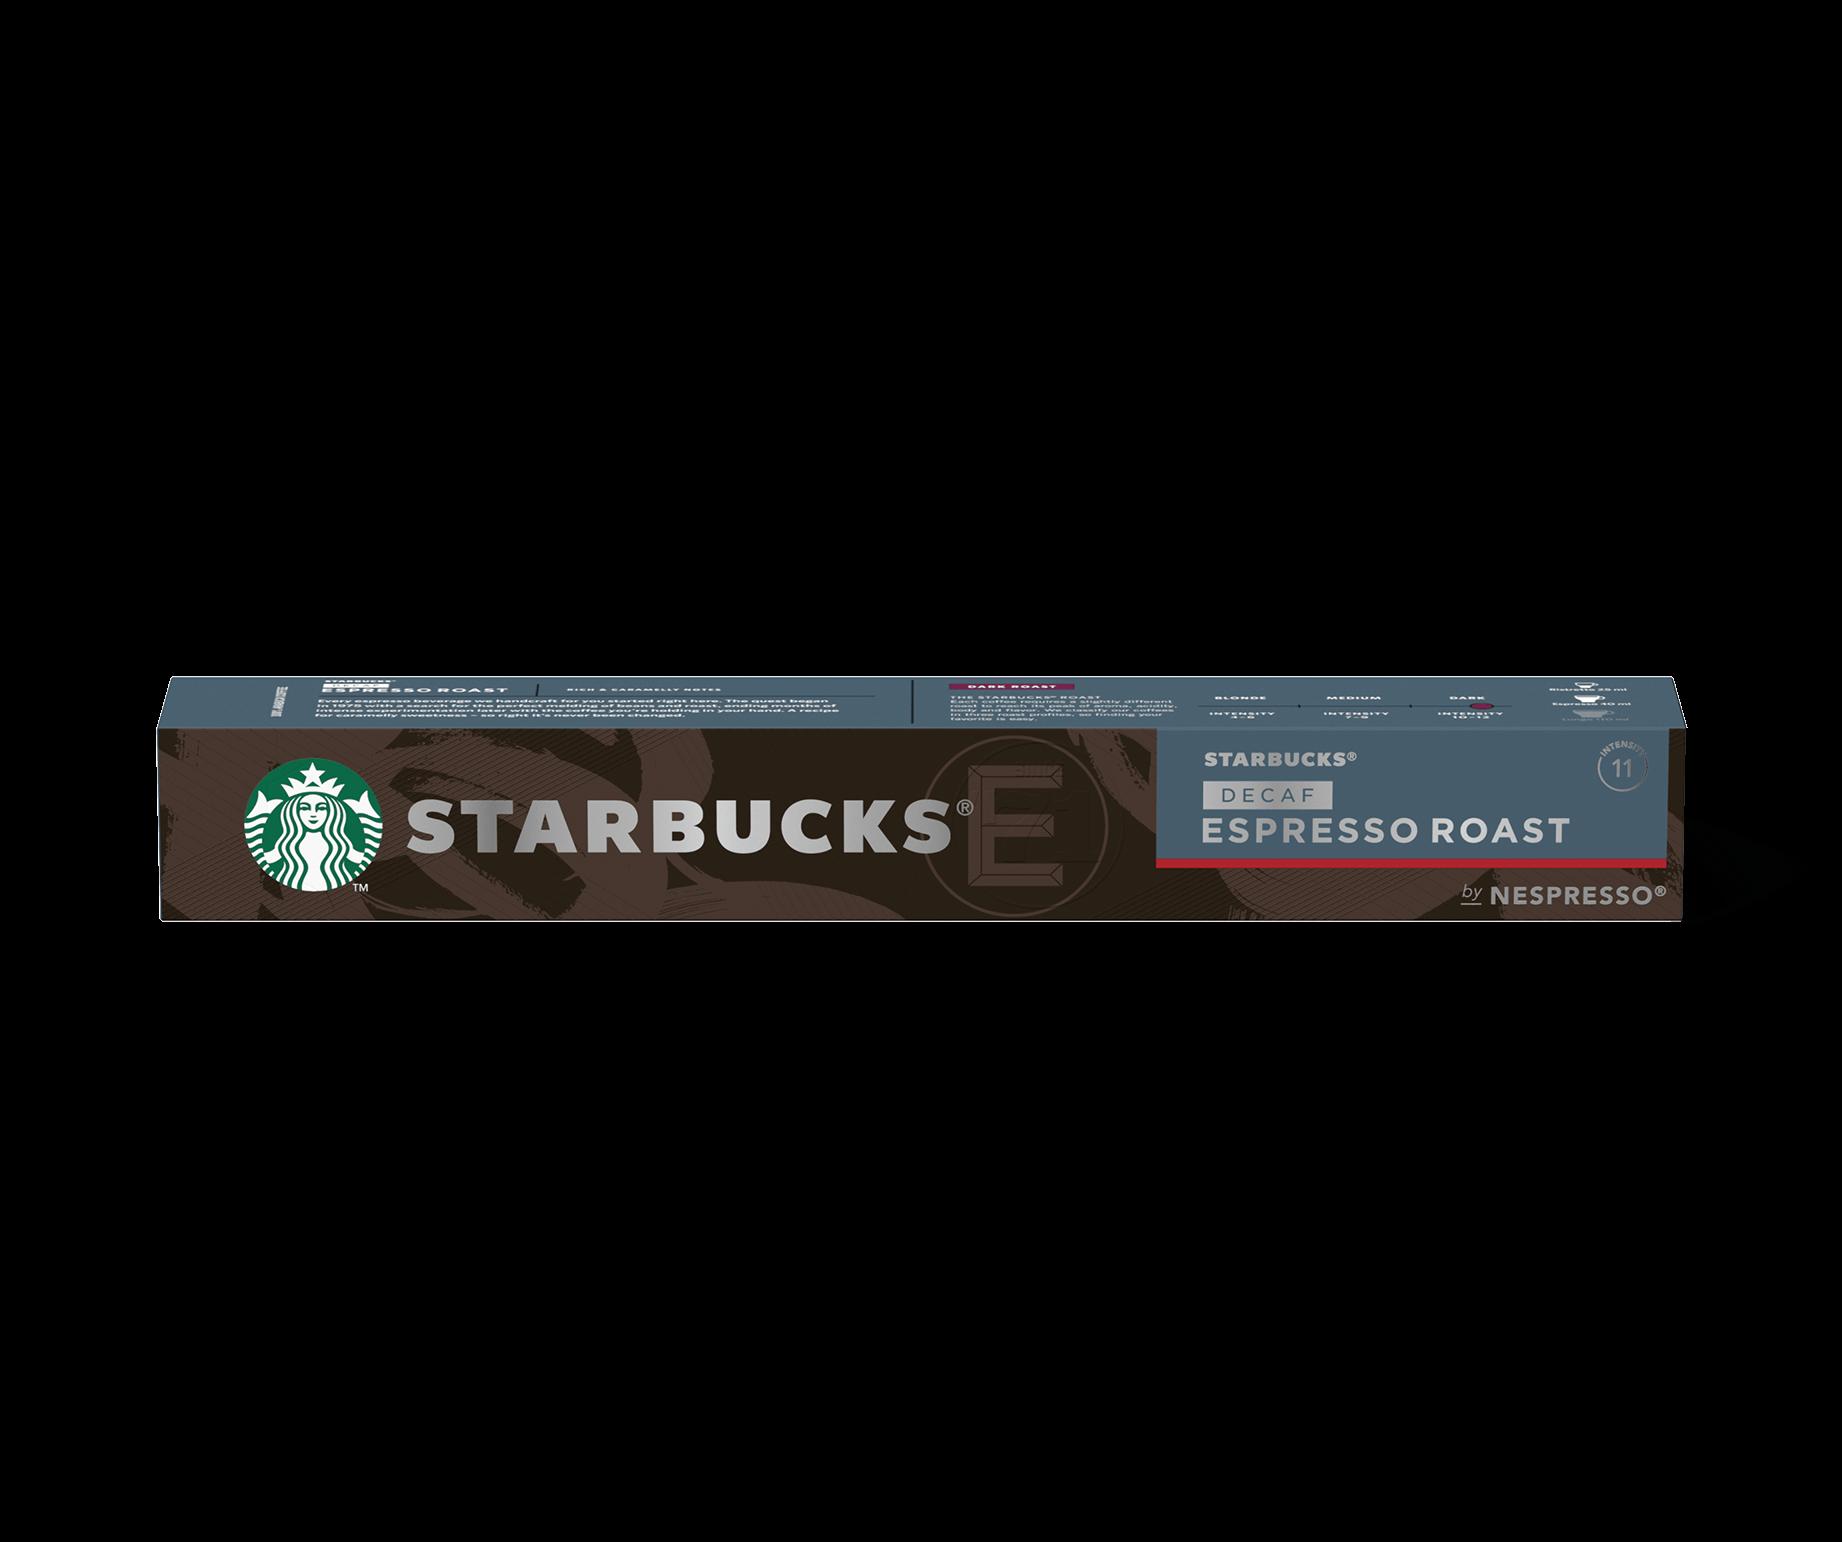 Starbucks Decaf Espresso Roast